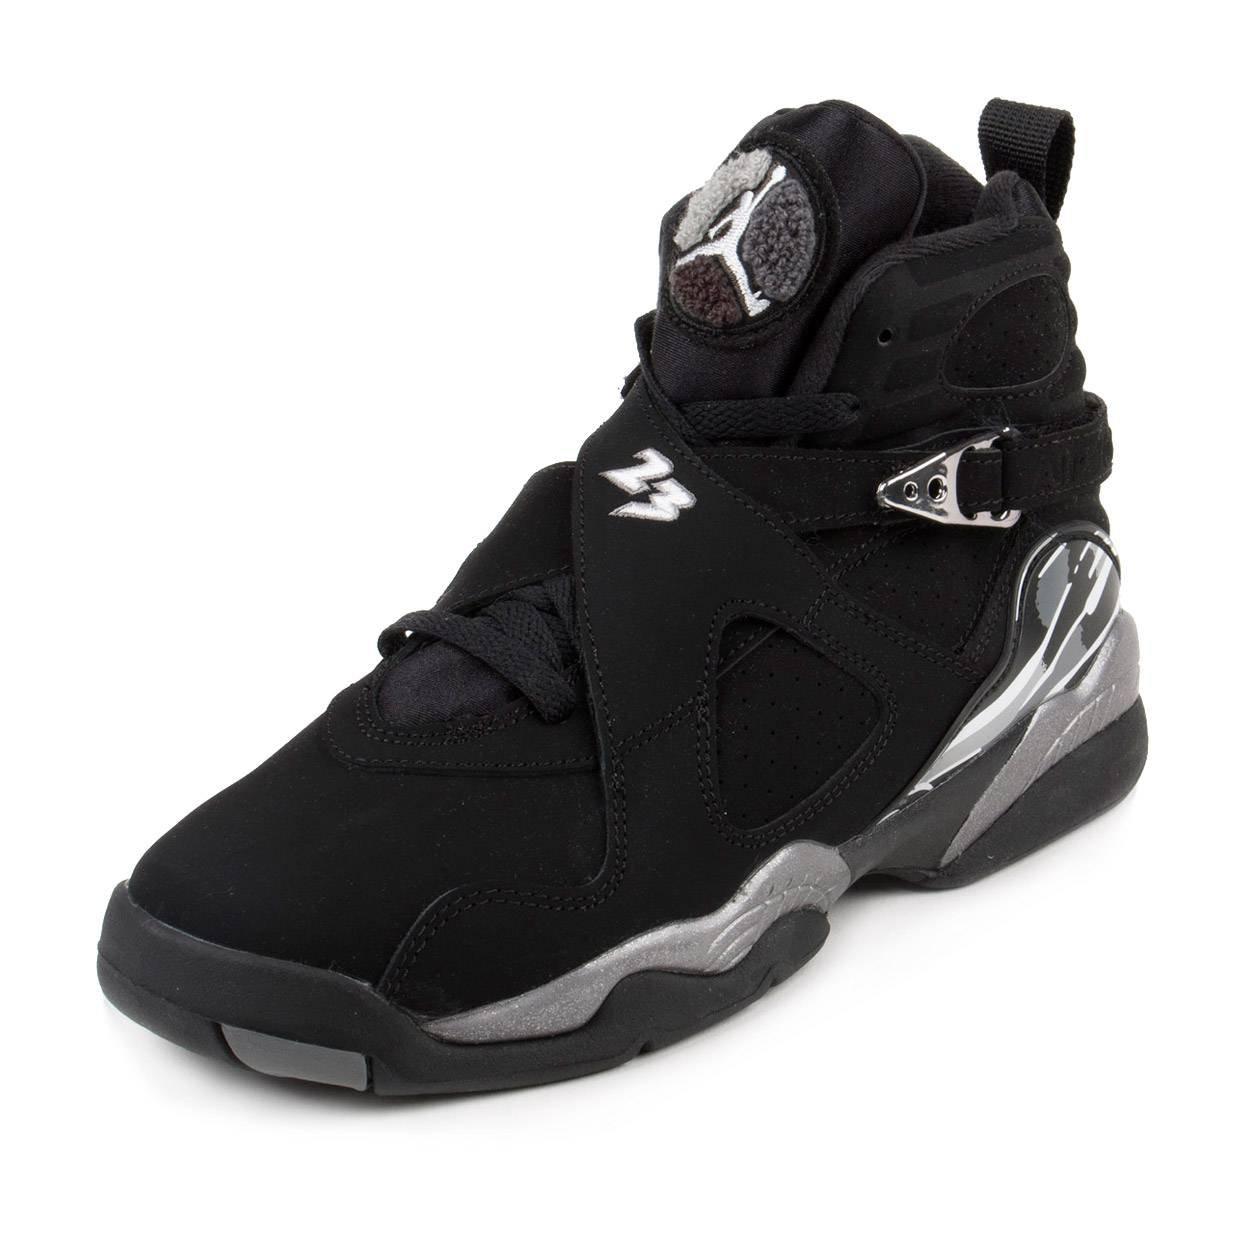 info for ec043 558c6 Nike Air Jordan 8 Retro BG 'Chrome' 305368-003 Black/White/Graphite Kids'  Shoes (5.5)